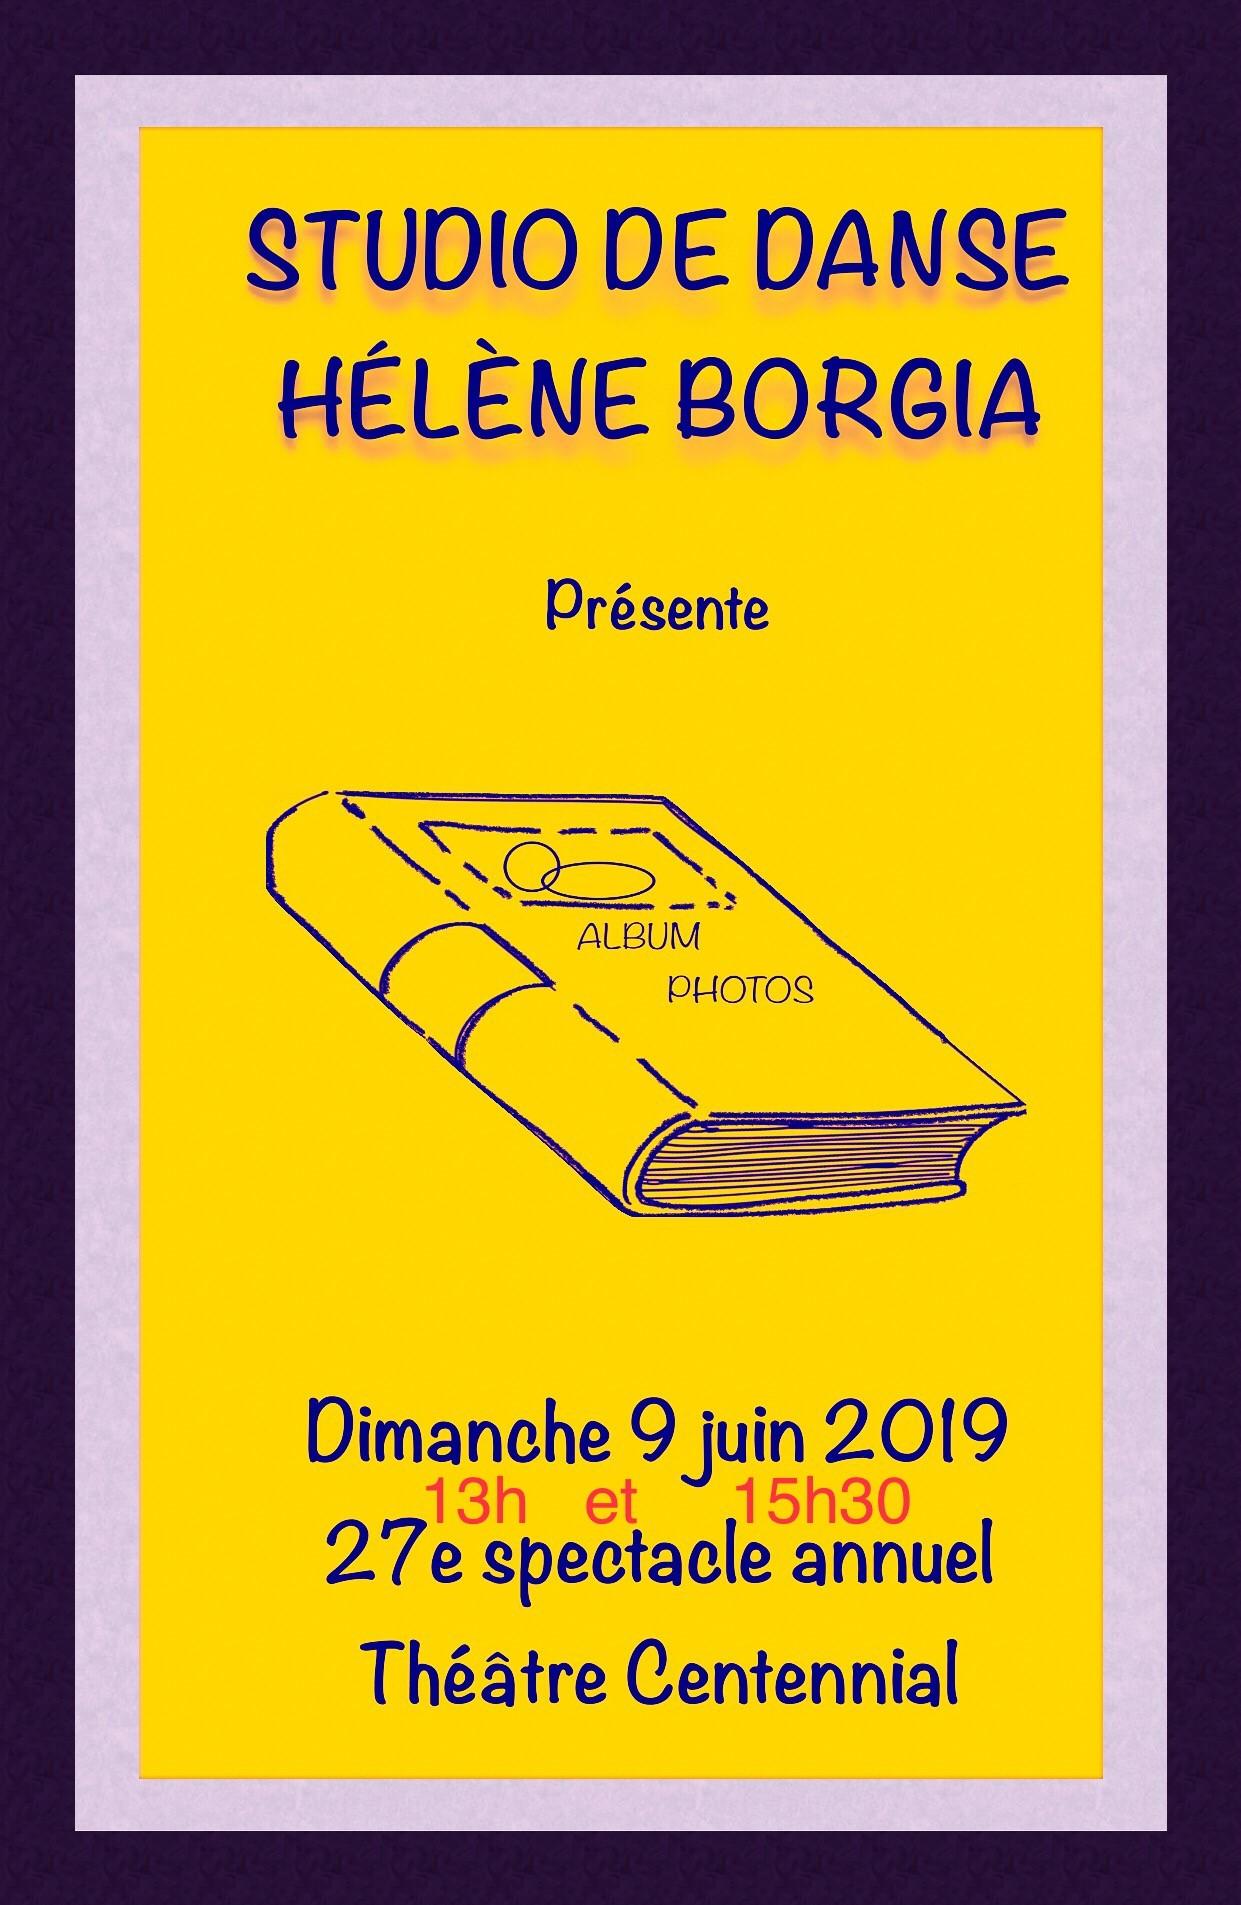 Studio de dance Hélène Borgia – L'album photo